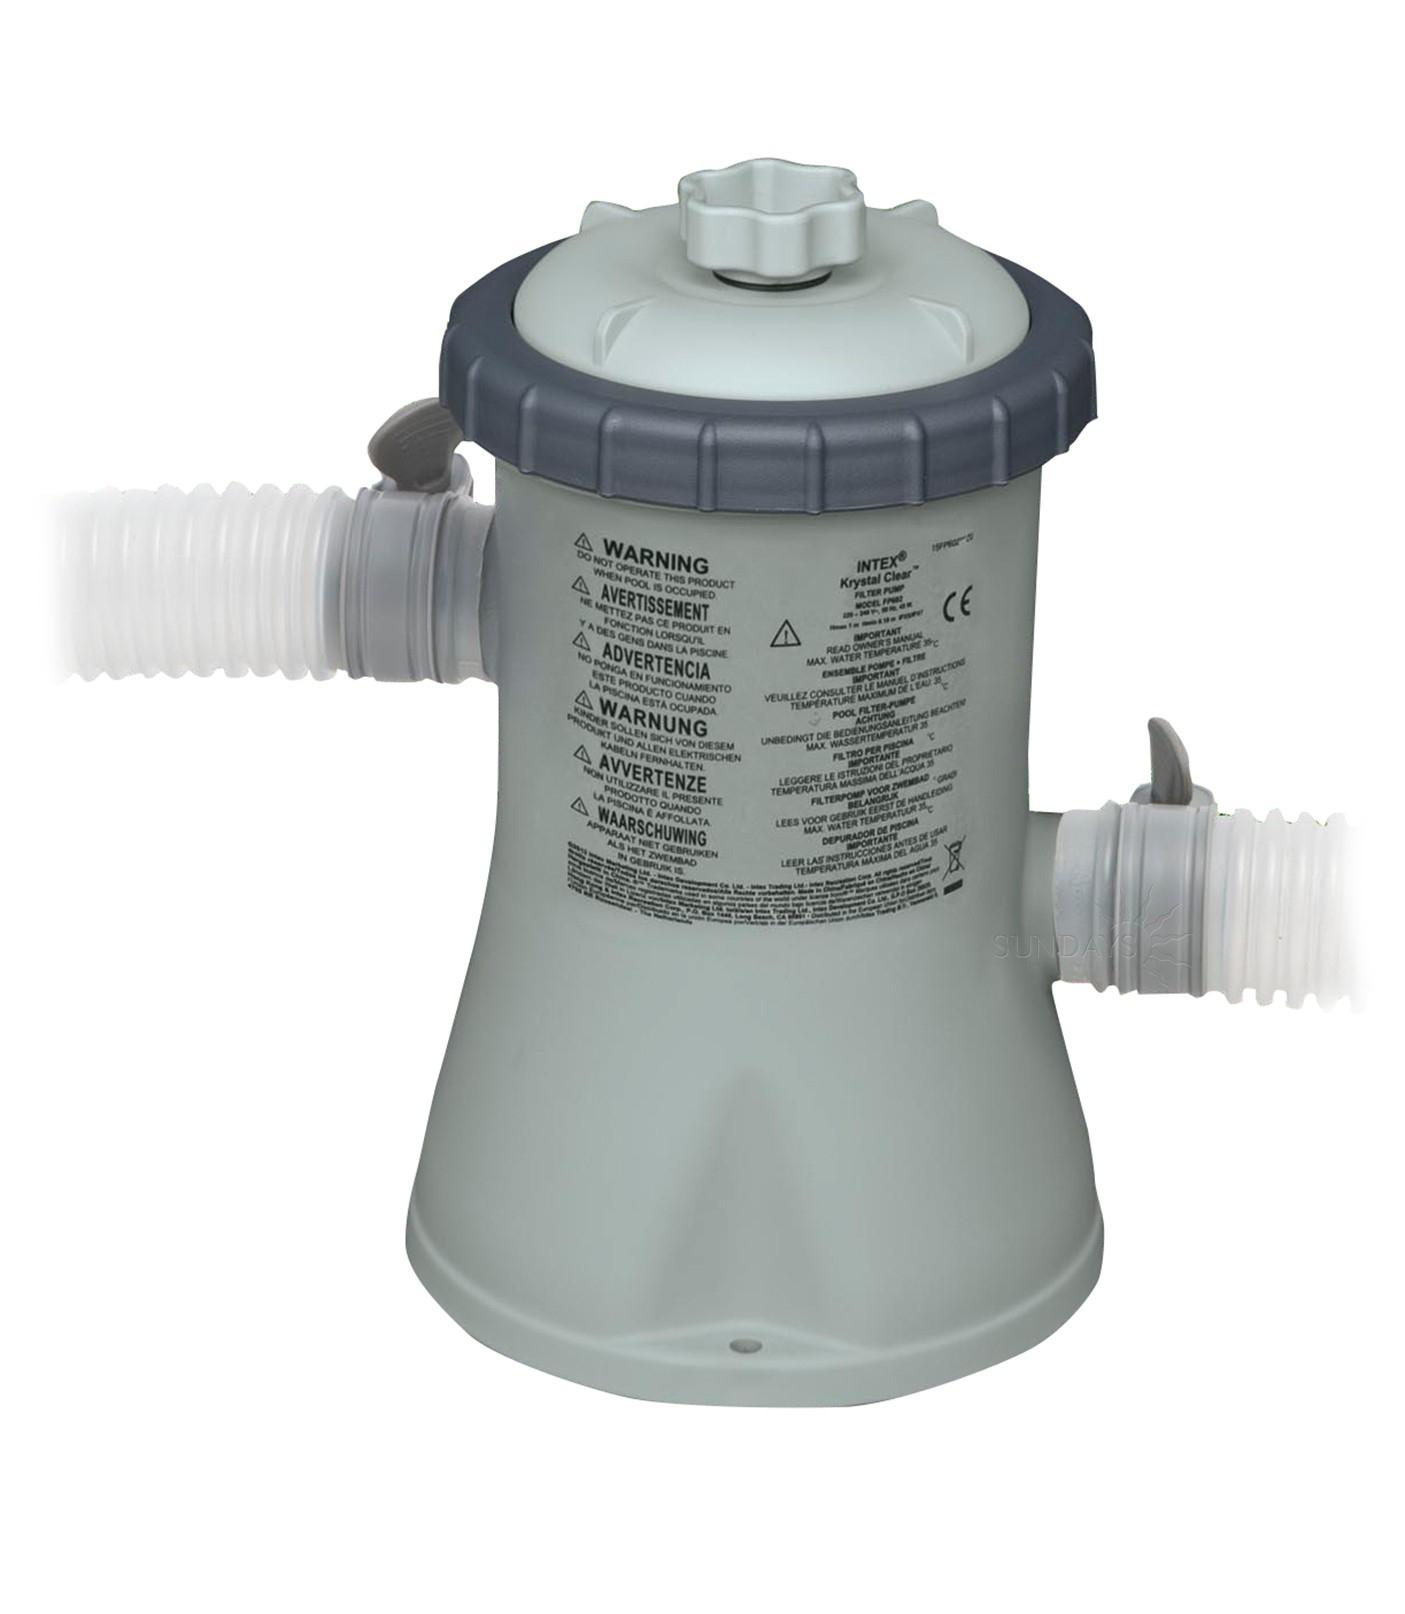 Pompa Filtrare Apa Piscina Intex 28602, 1250 L Apa/h à Filtre Pompe Piscine Intex